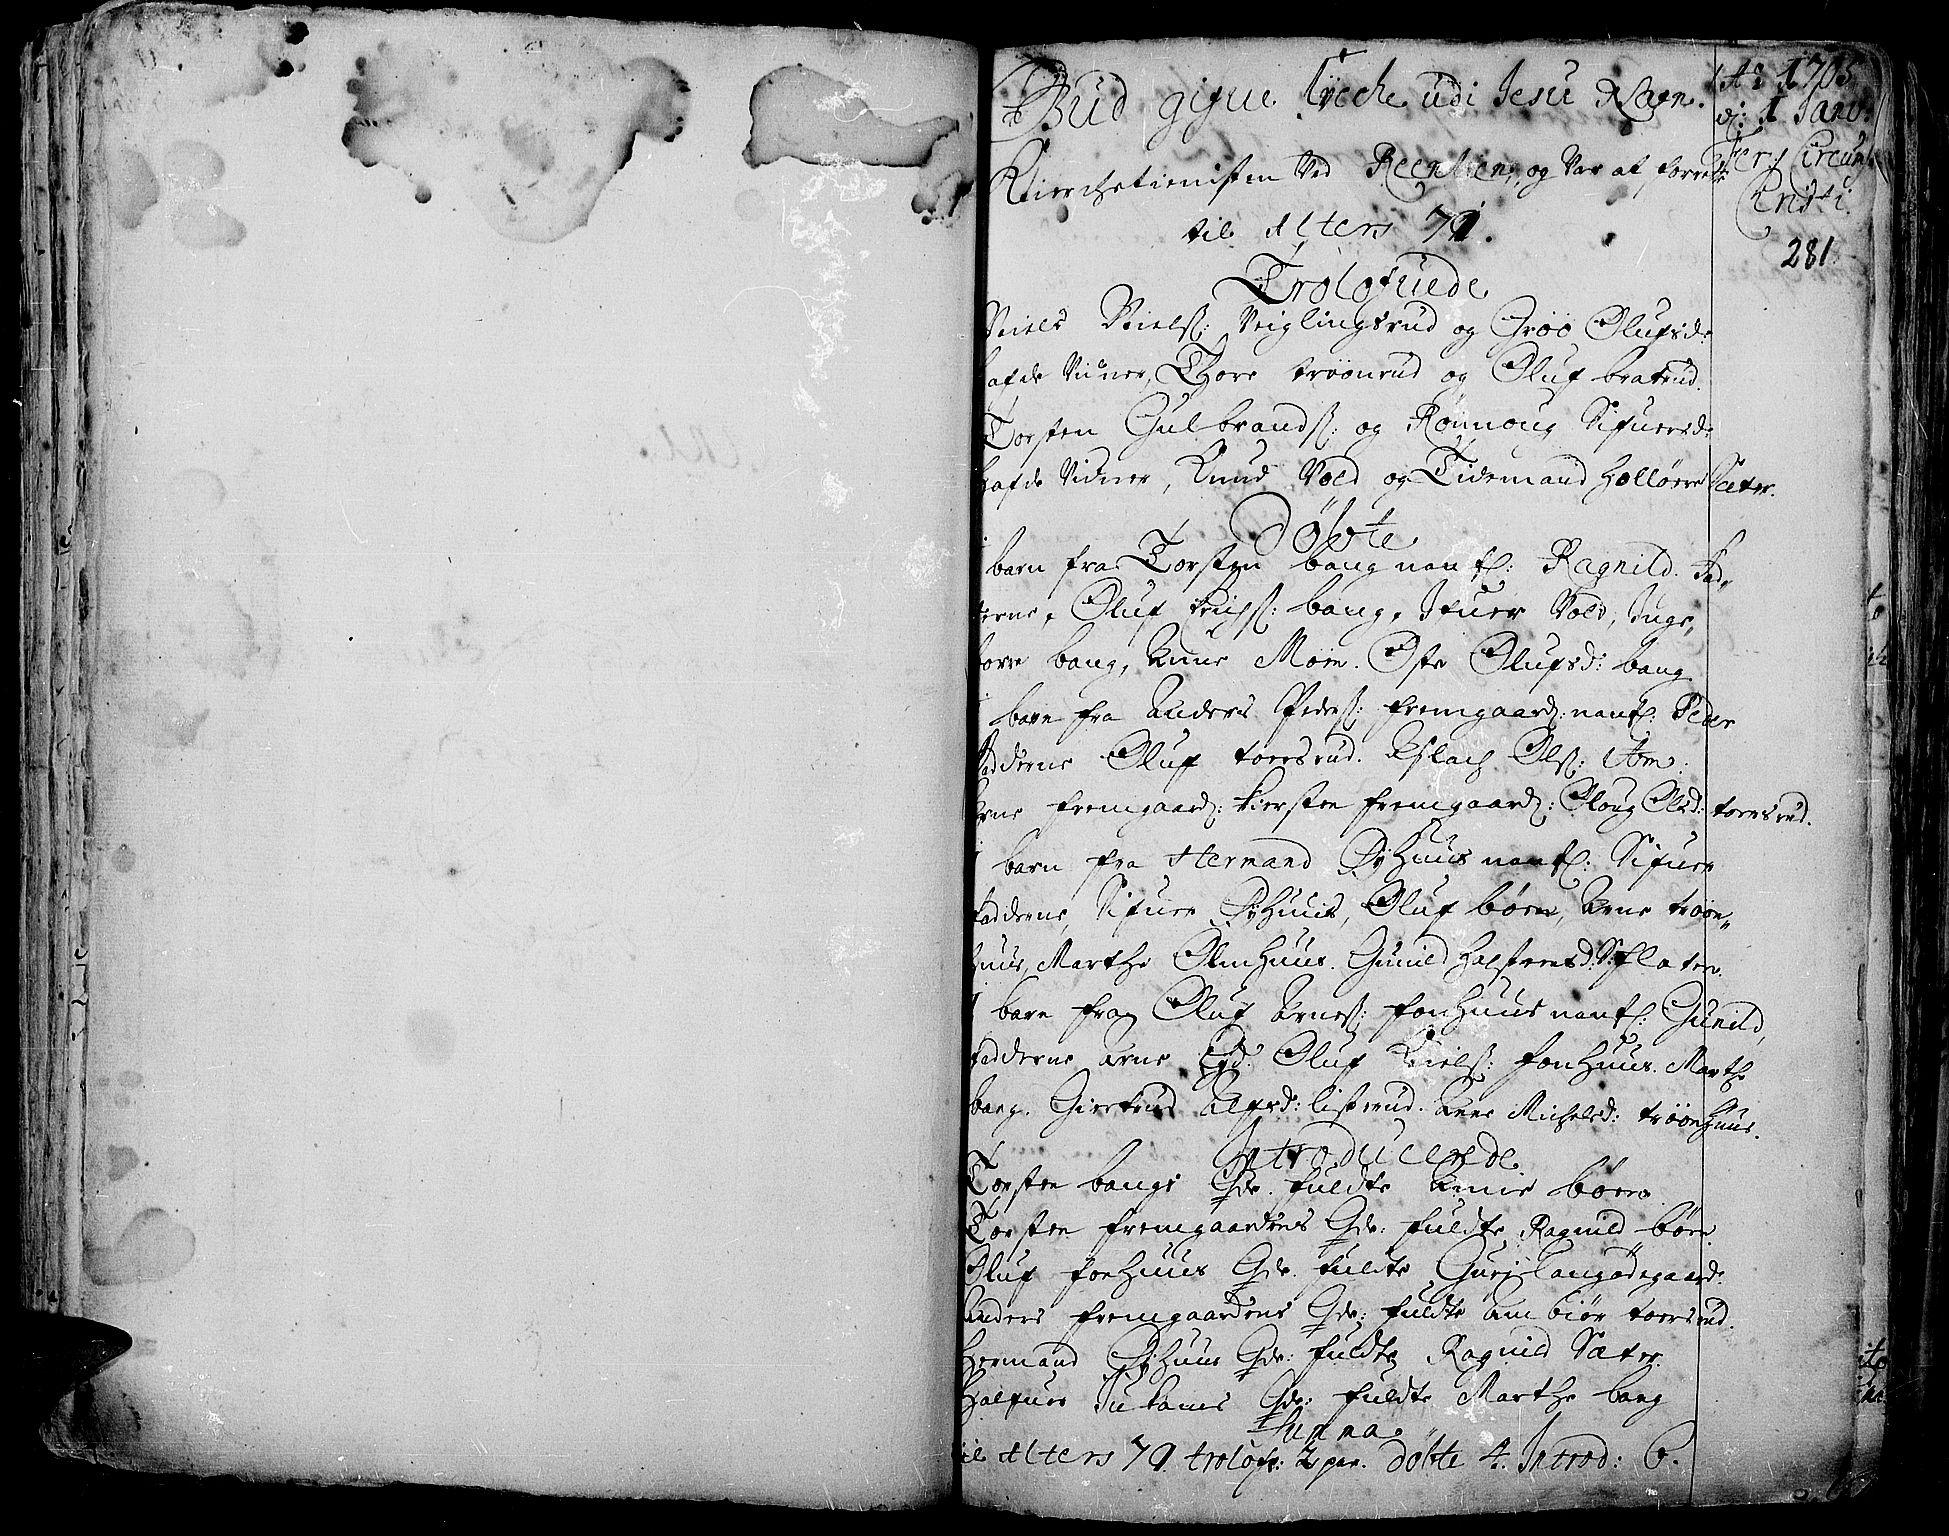 SAH, Aurdal prestekontor, Ministerialbok nr. 1-3, 1692-1730, s. 281